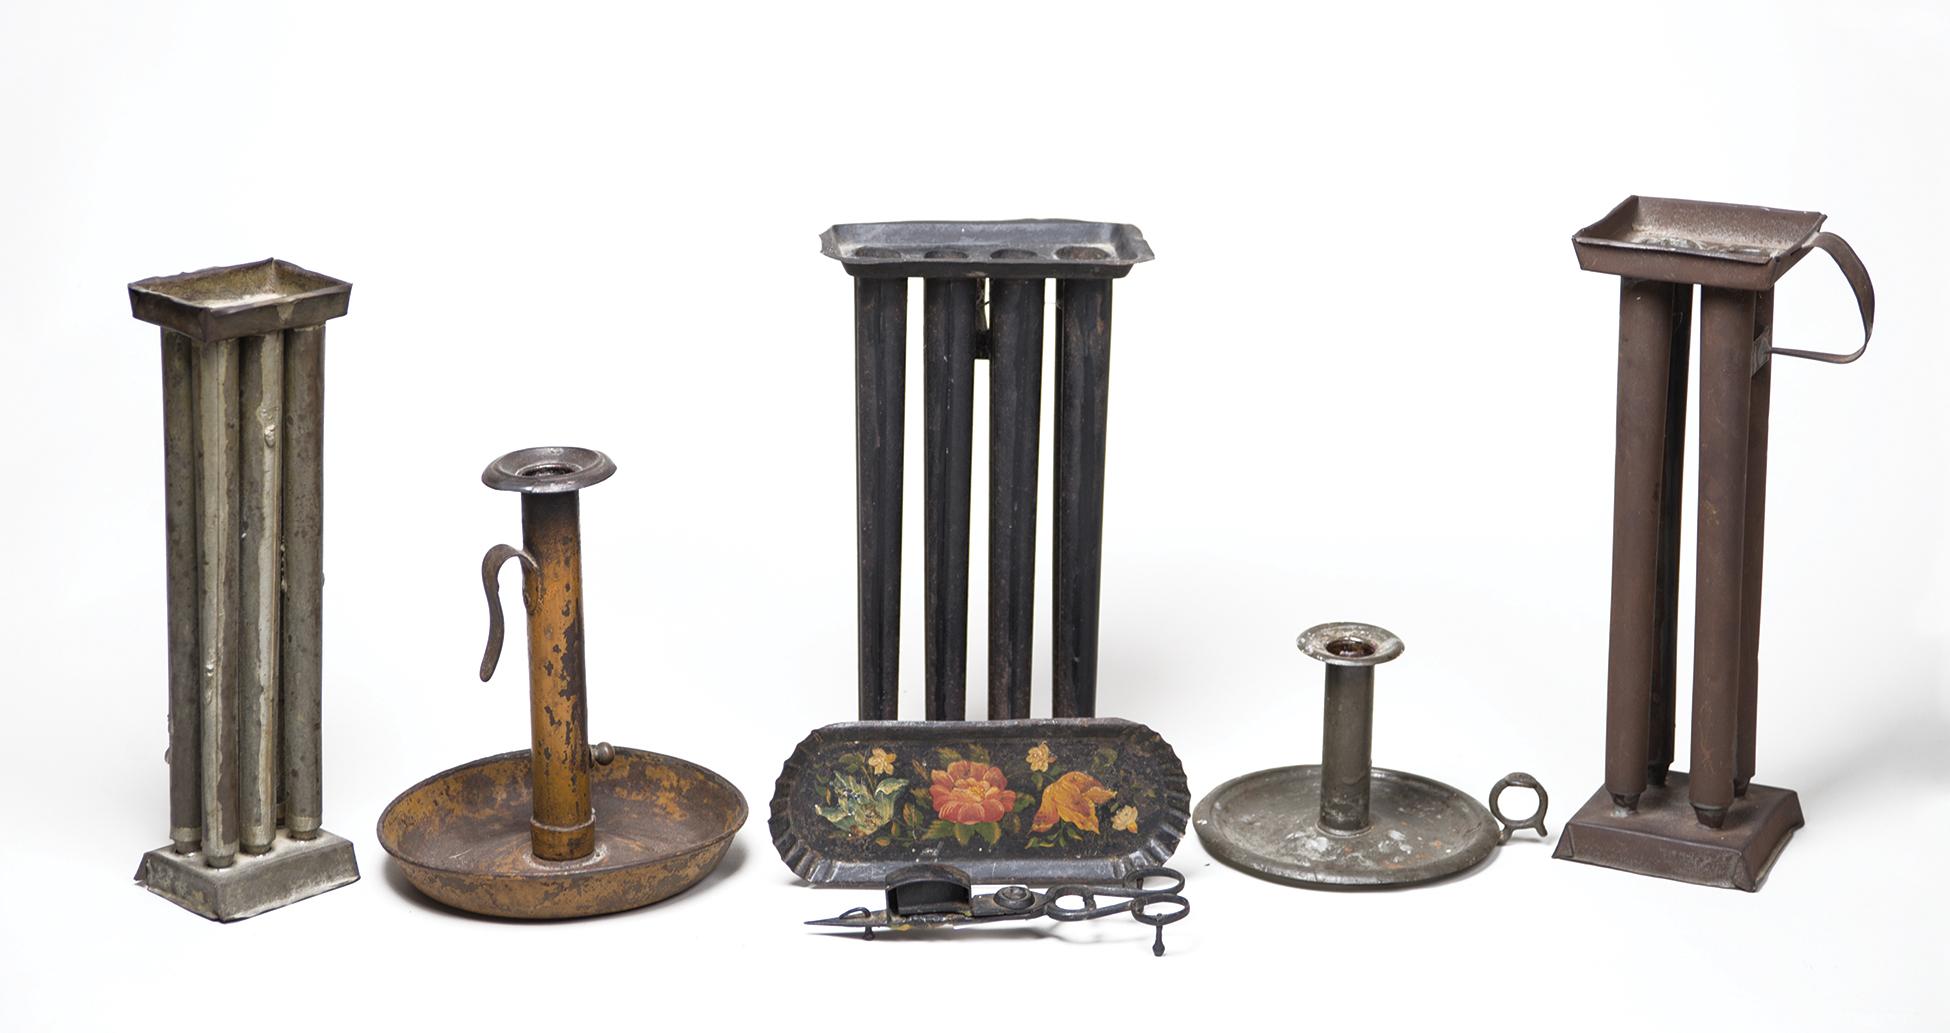 candle, molds, chambersticks